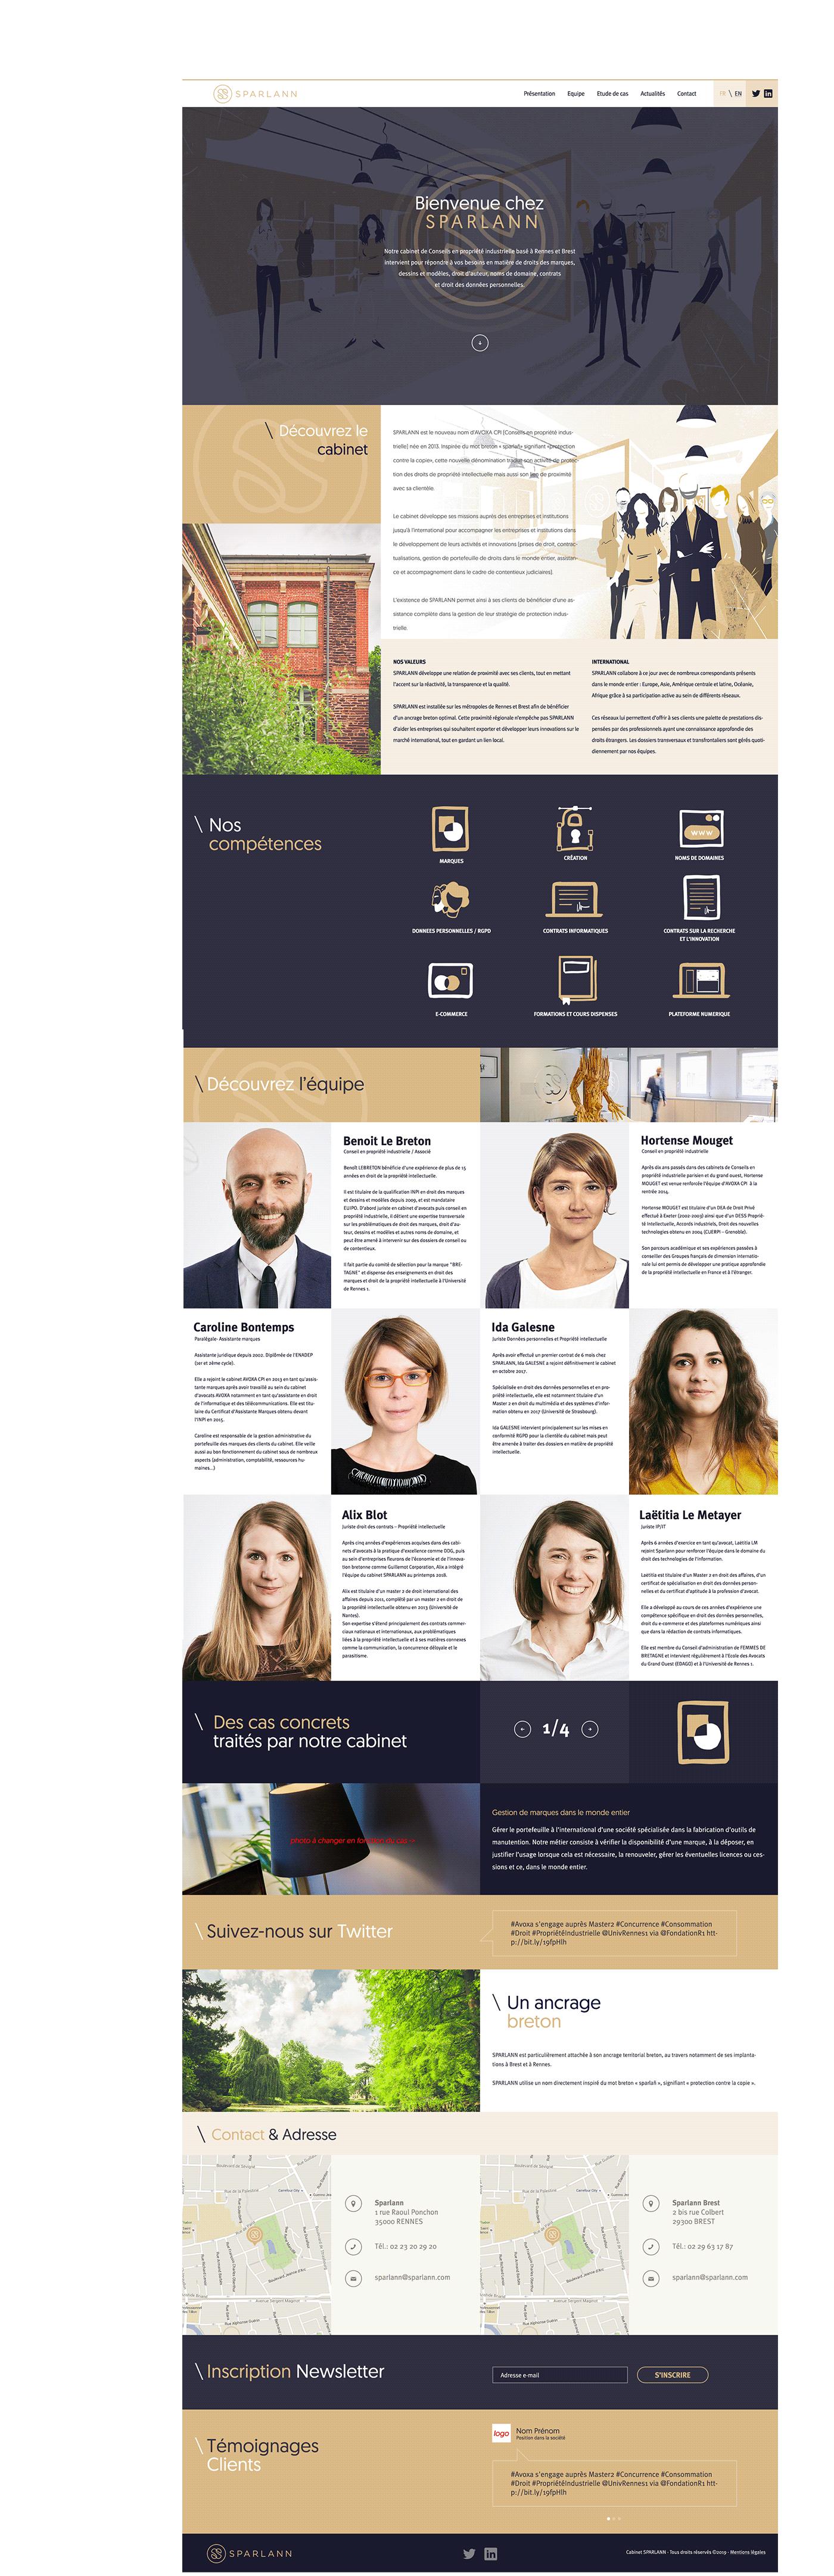 avocat branding  ILLUSTRATION  lawyers Office Pictogramme portraits site internet